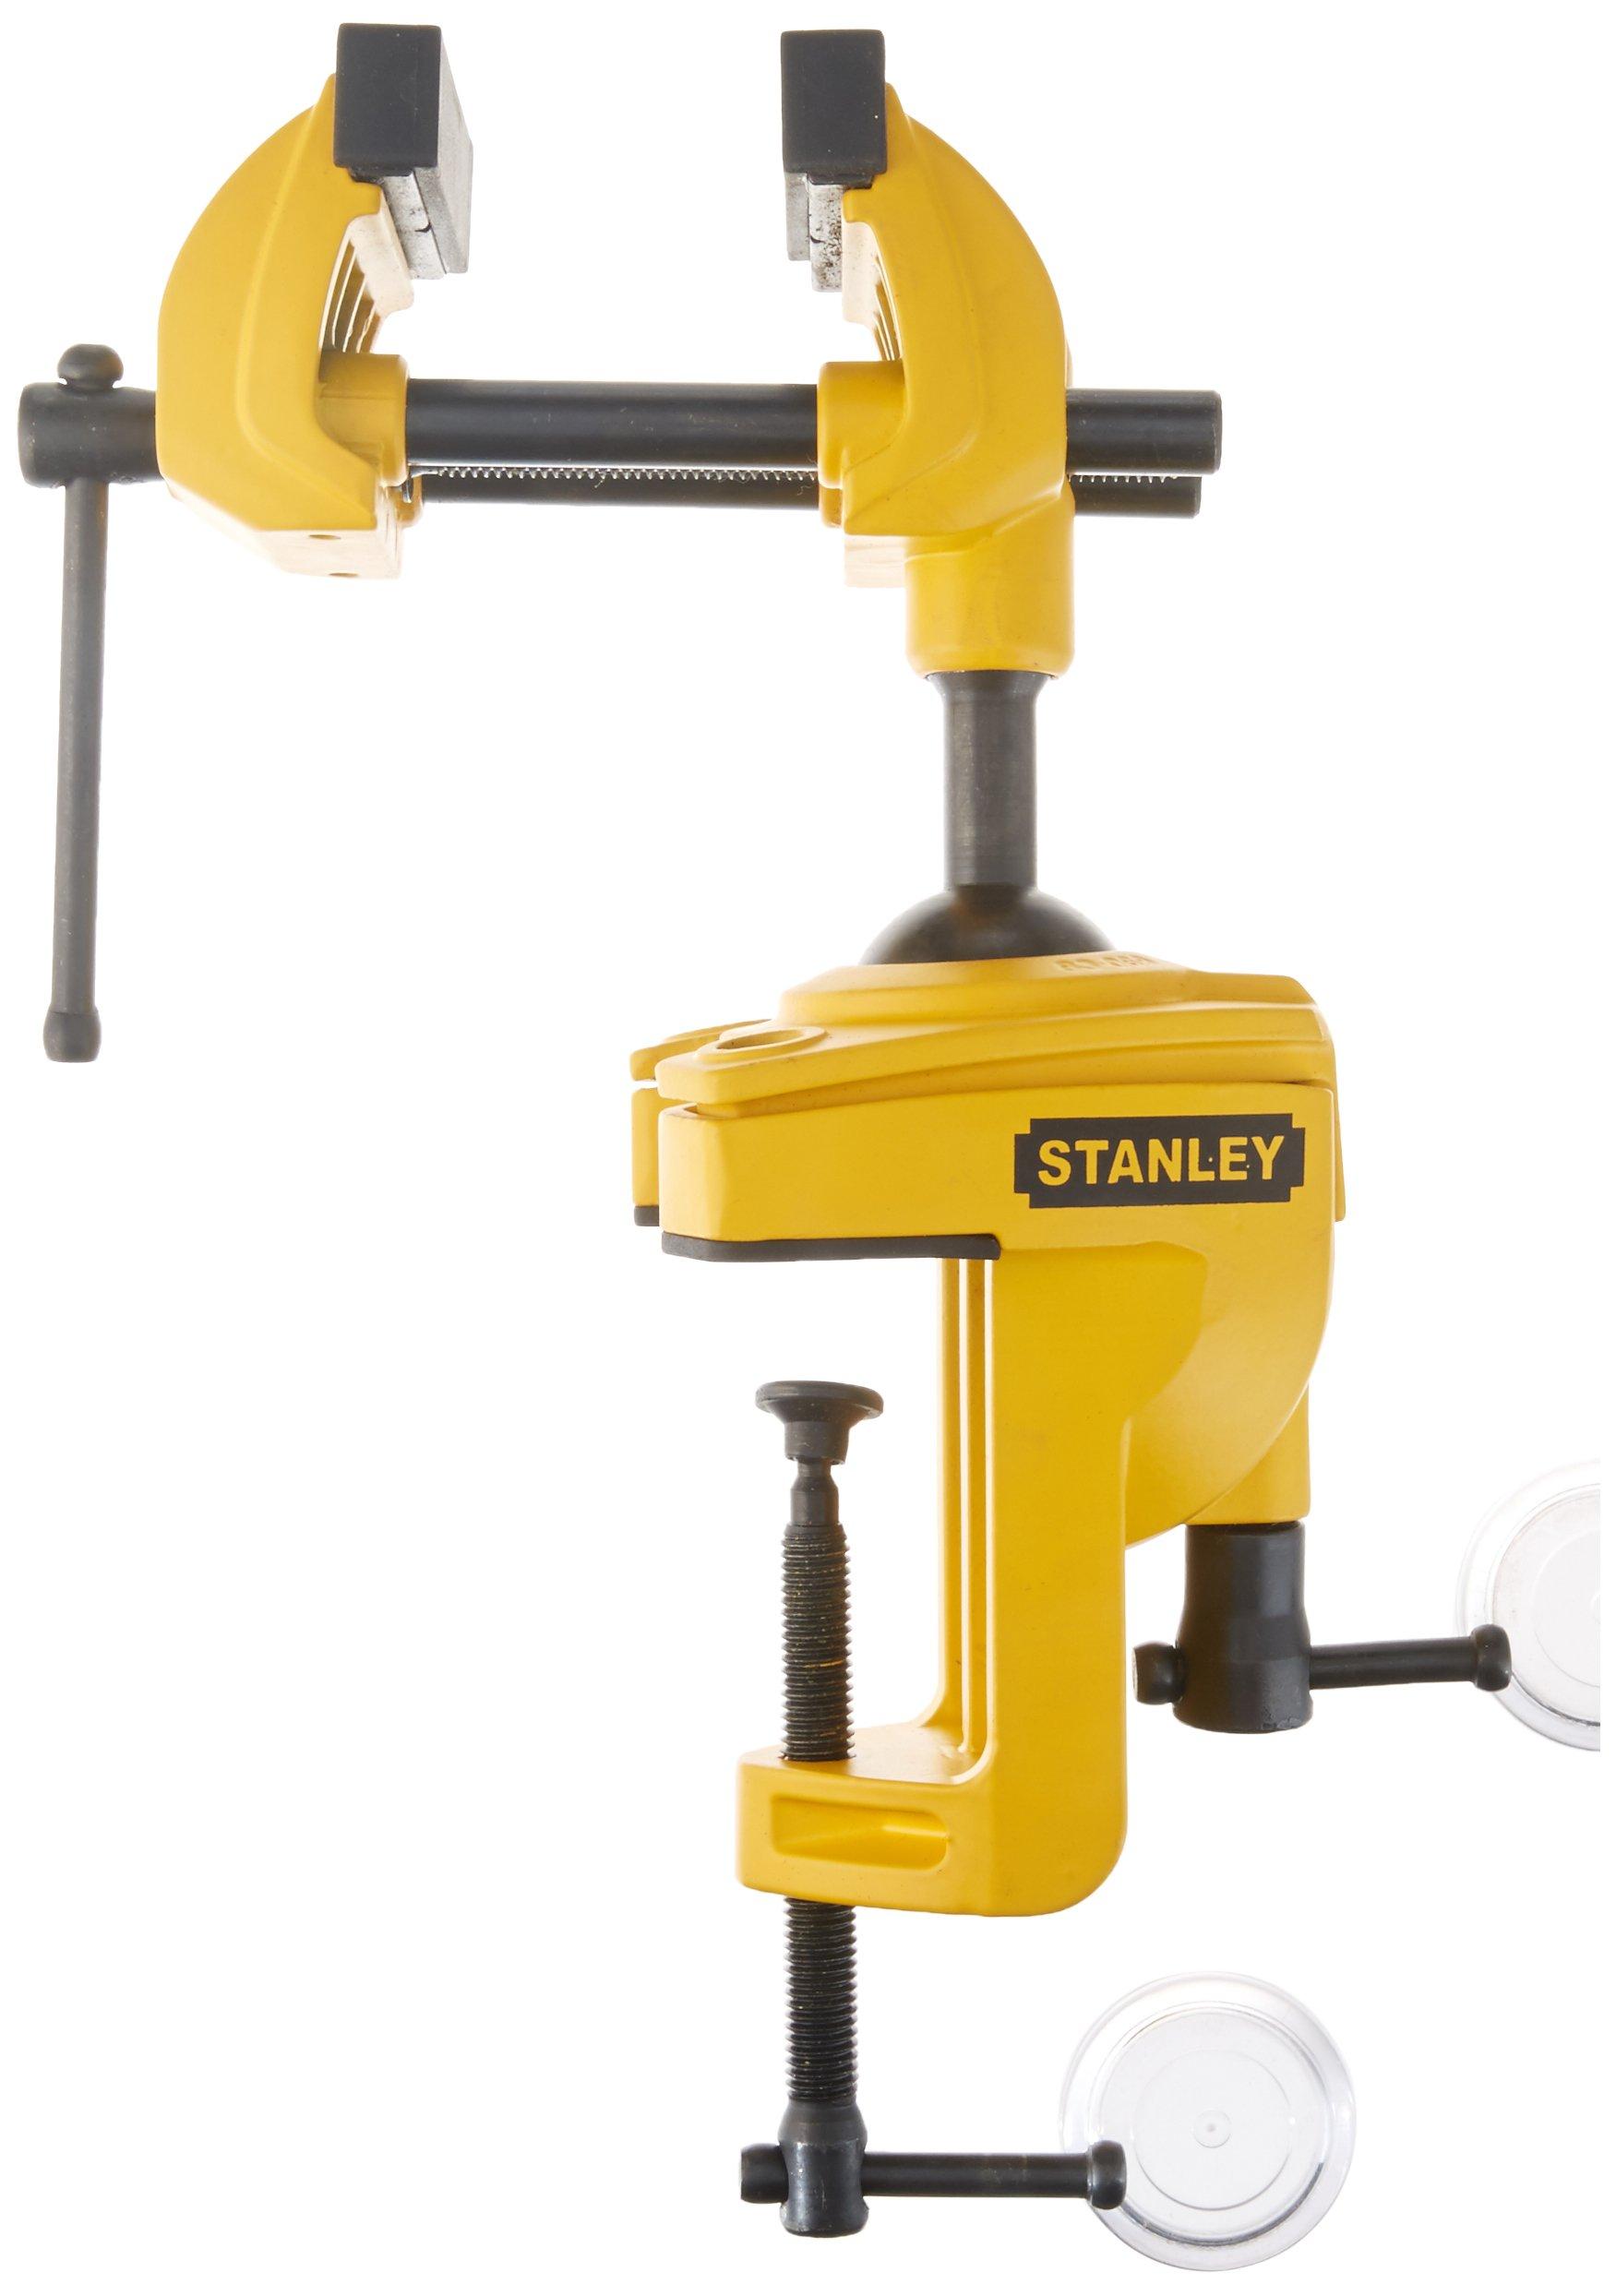 Stanley 1-83-069 MaxSteel Multi Angle Hobby Vice, Yellow/Black